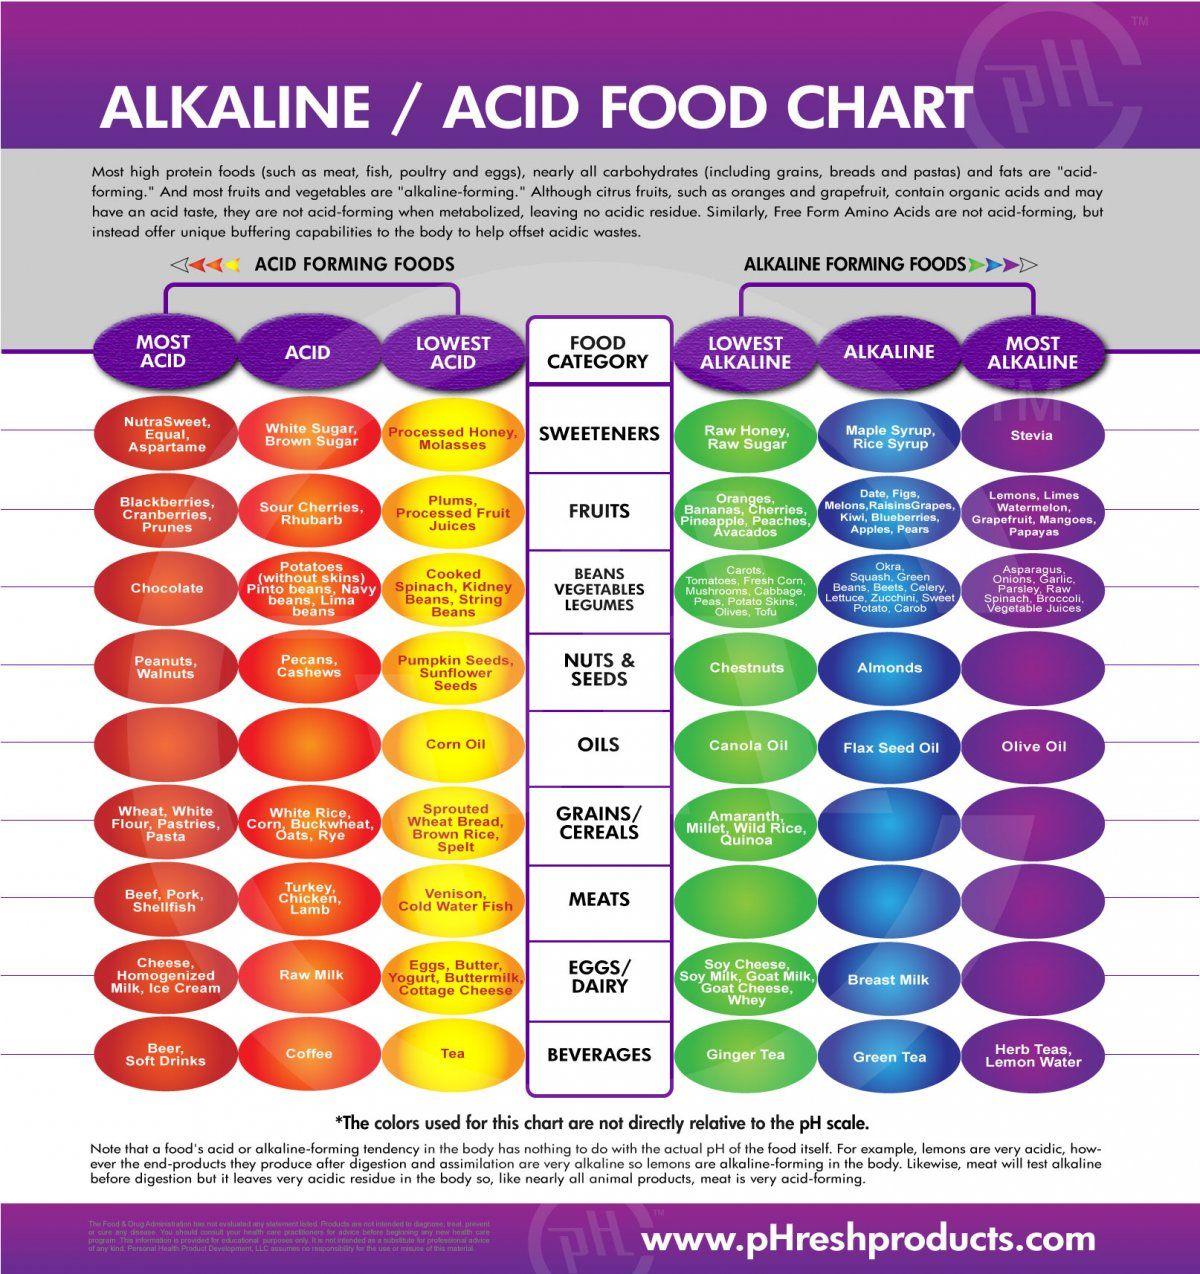 Alkaline acid food chart food for thought alkaline foods acidic